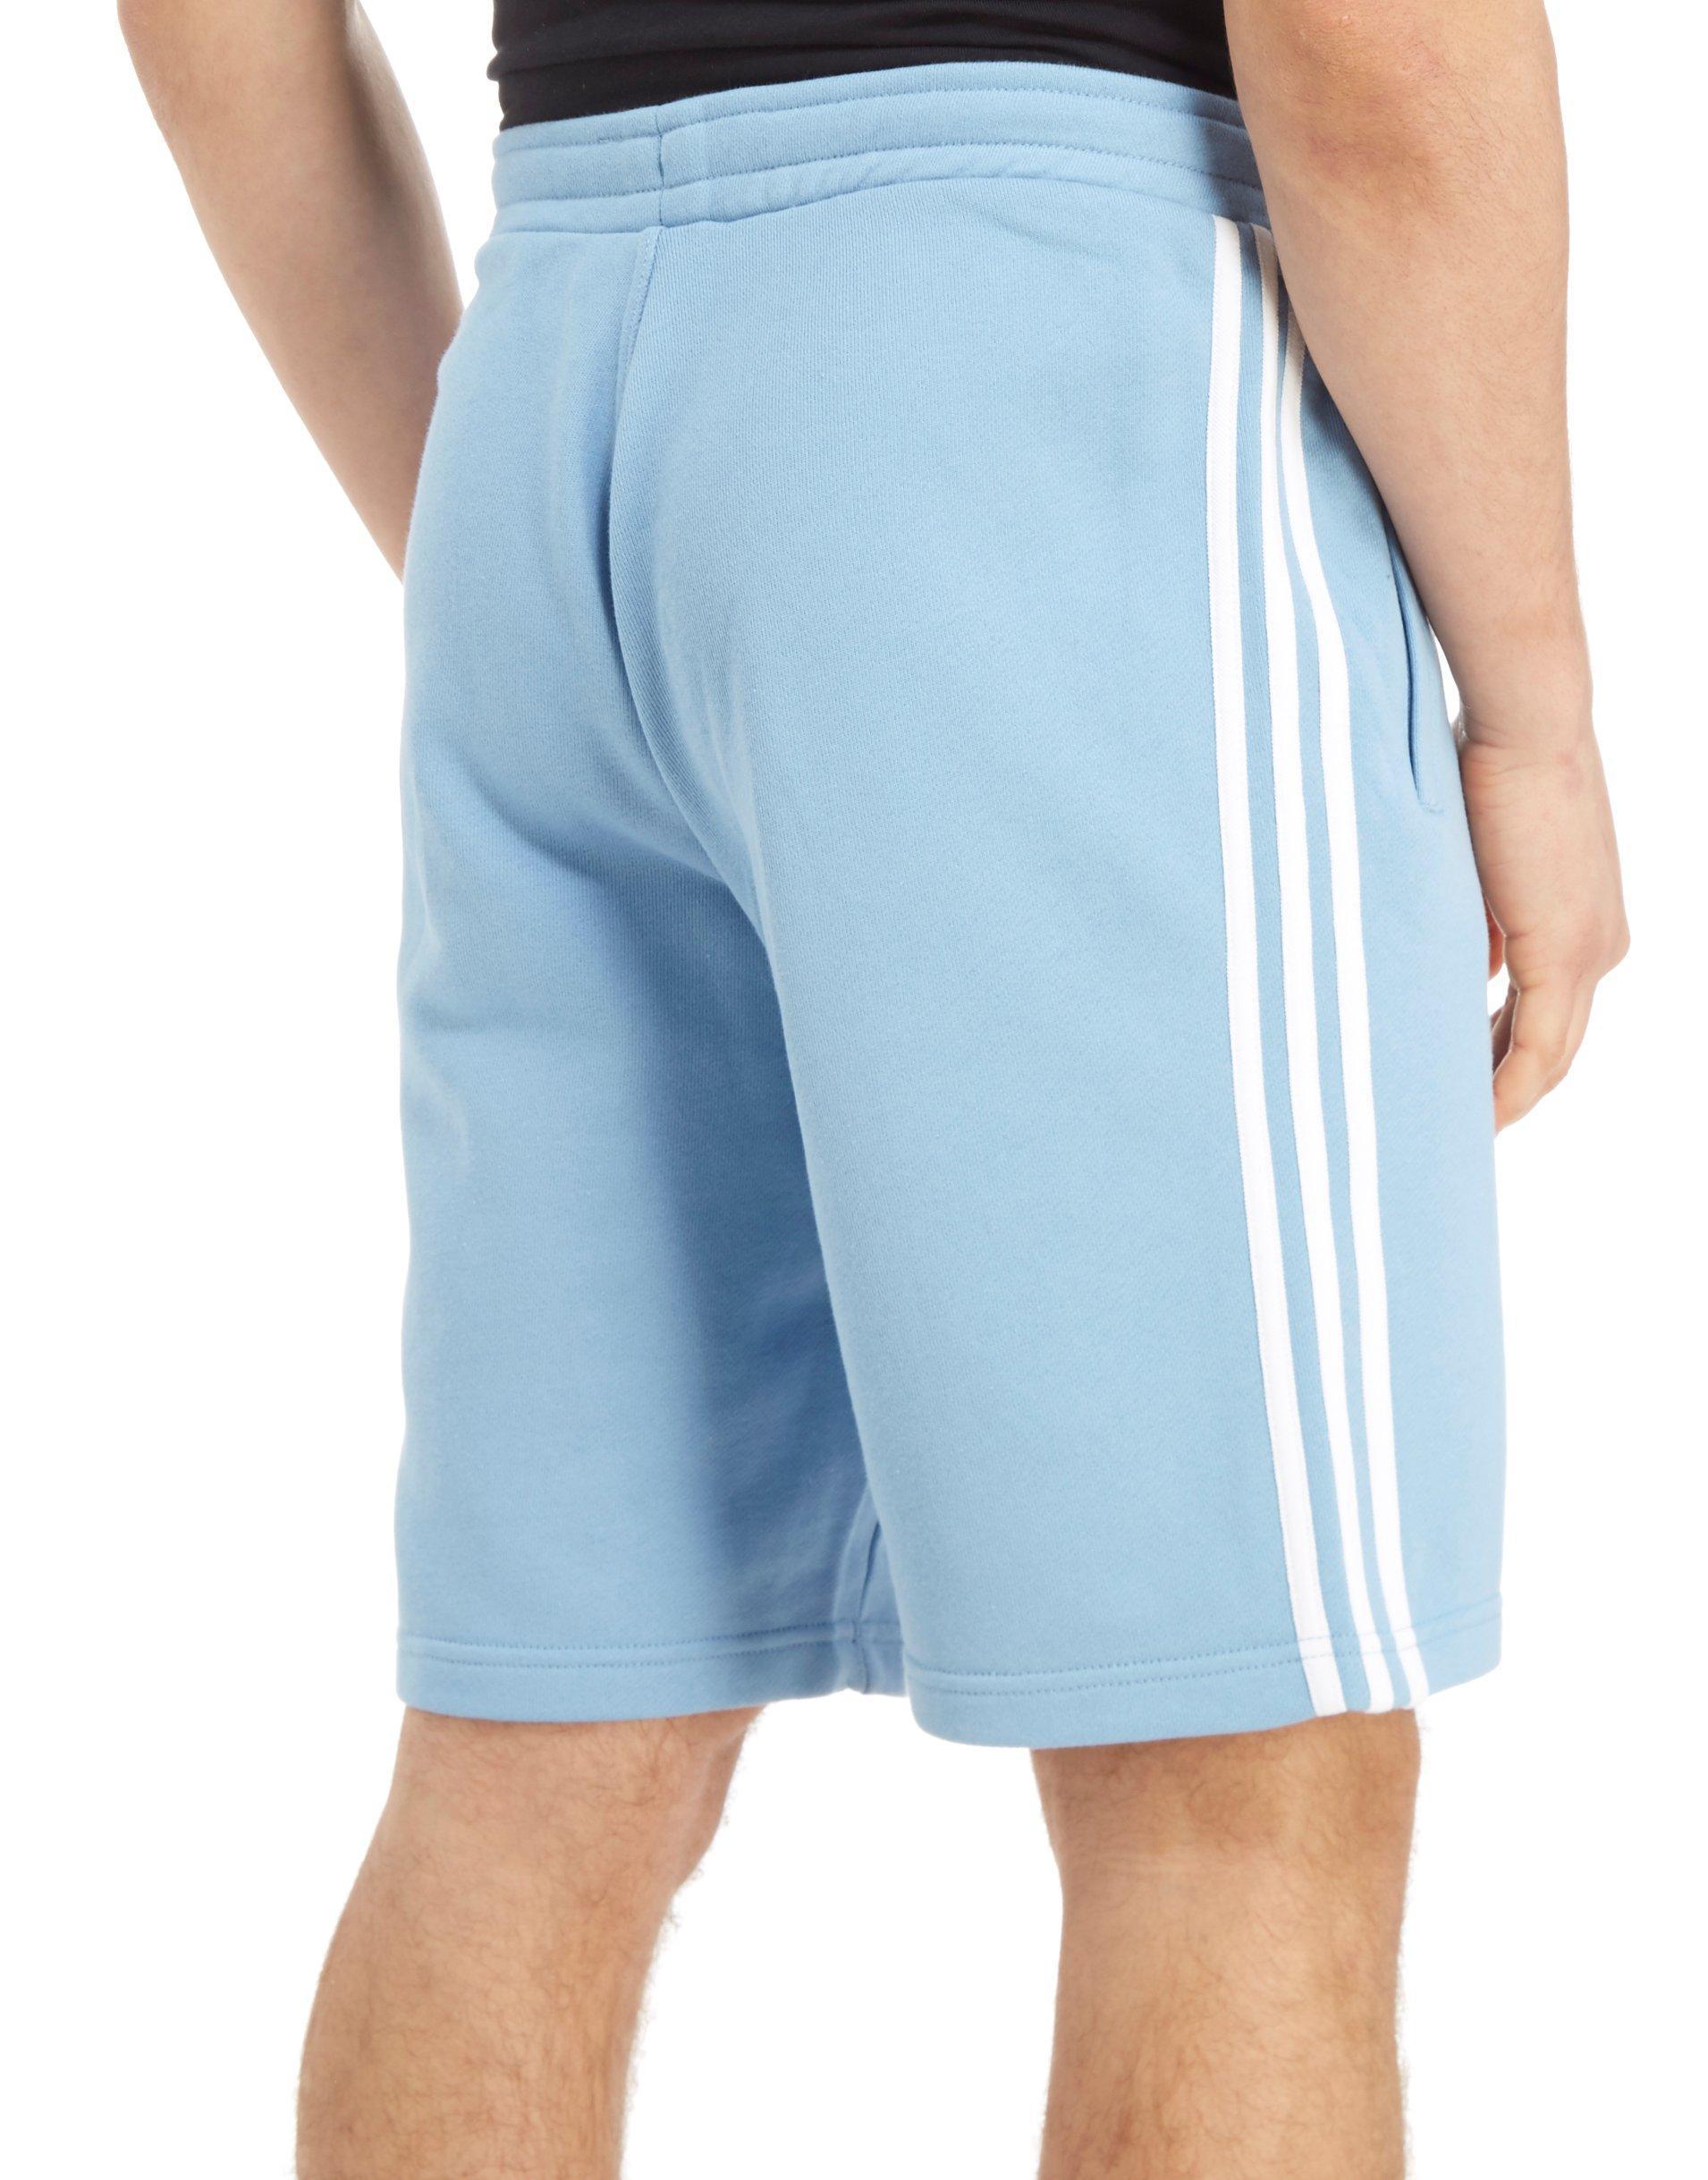 déficit moderadamente atributo  adidas Originals California Fleece Shorts in Blue/White (Blue) for Men -  Lyst